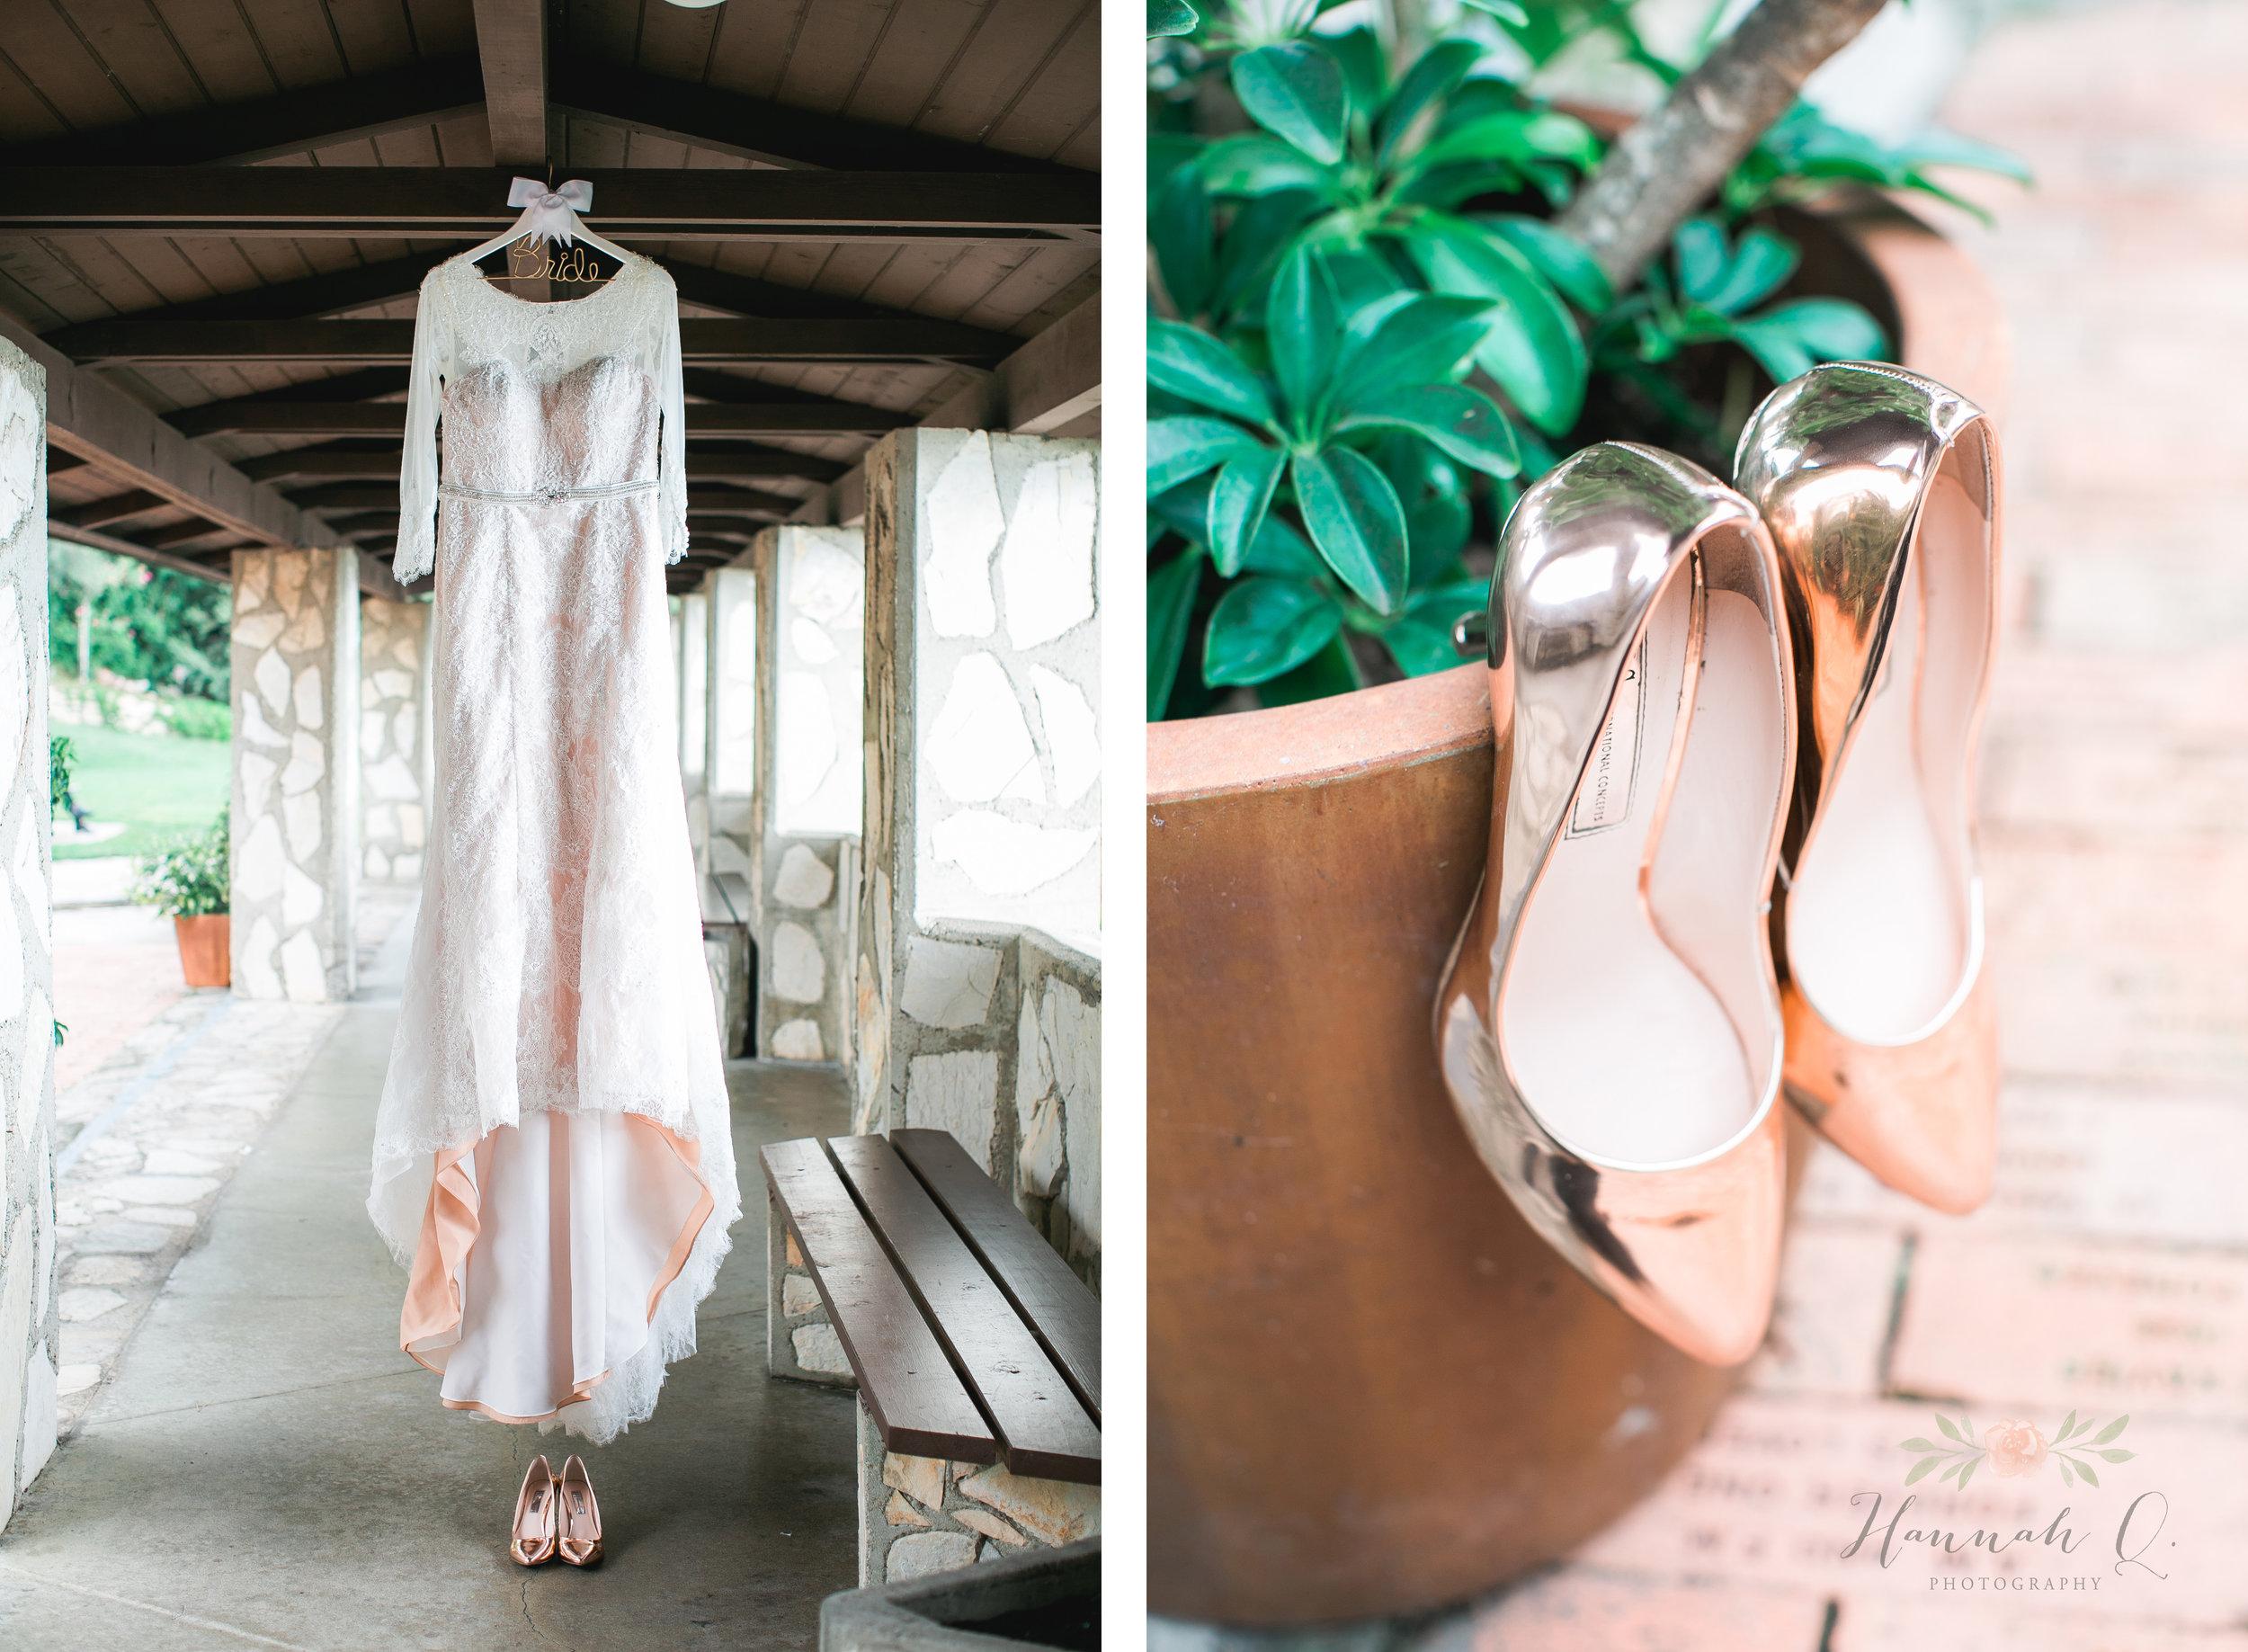 Metallic shoes--so so perfect.